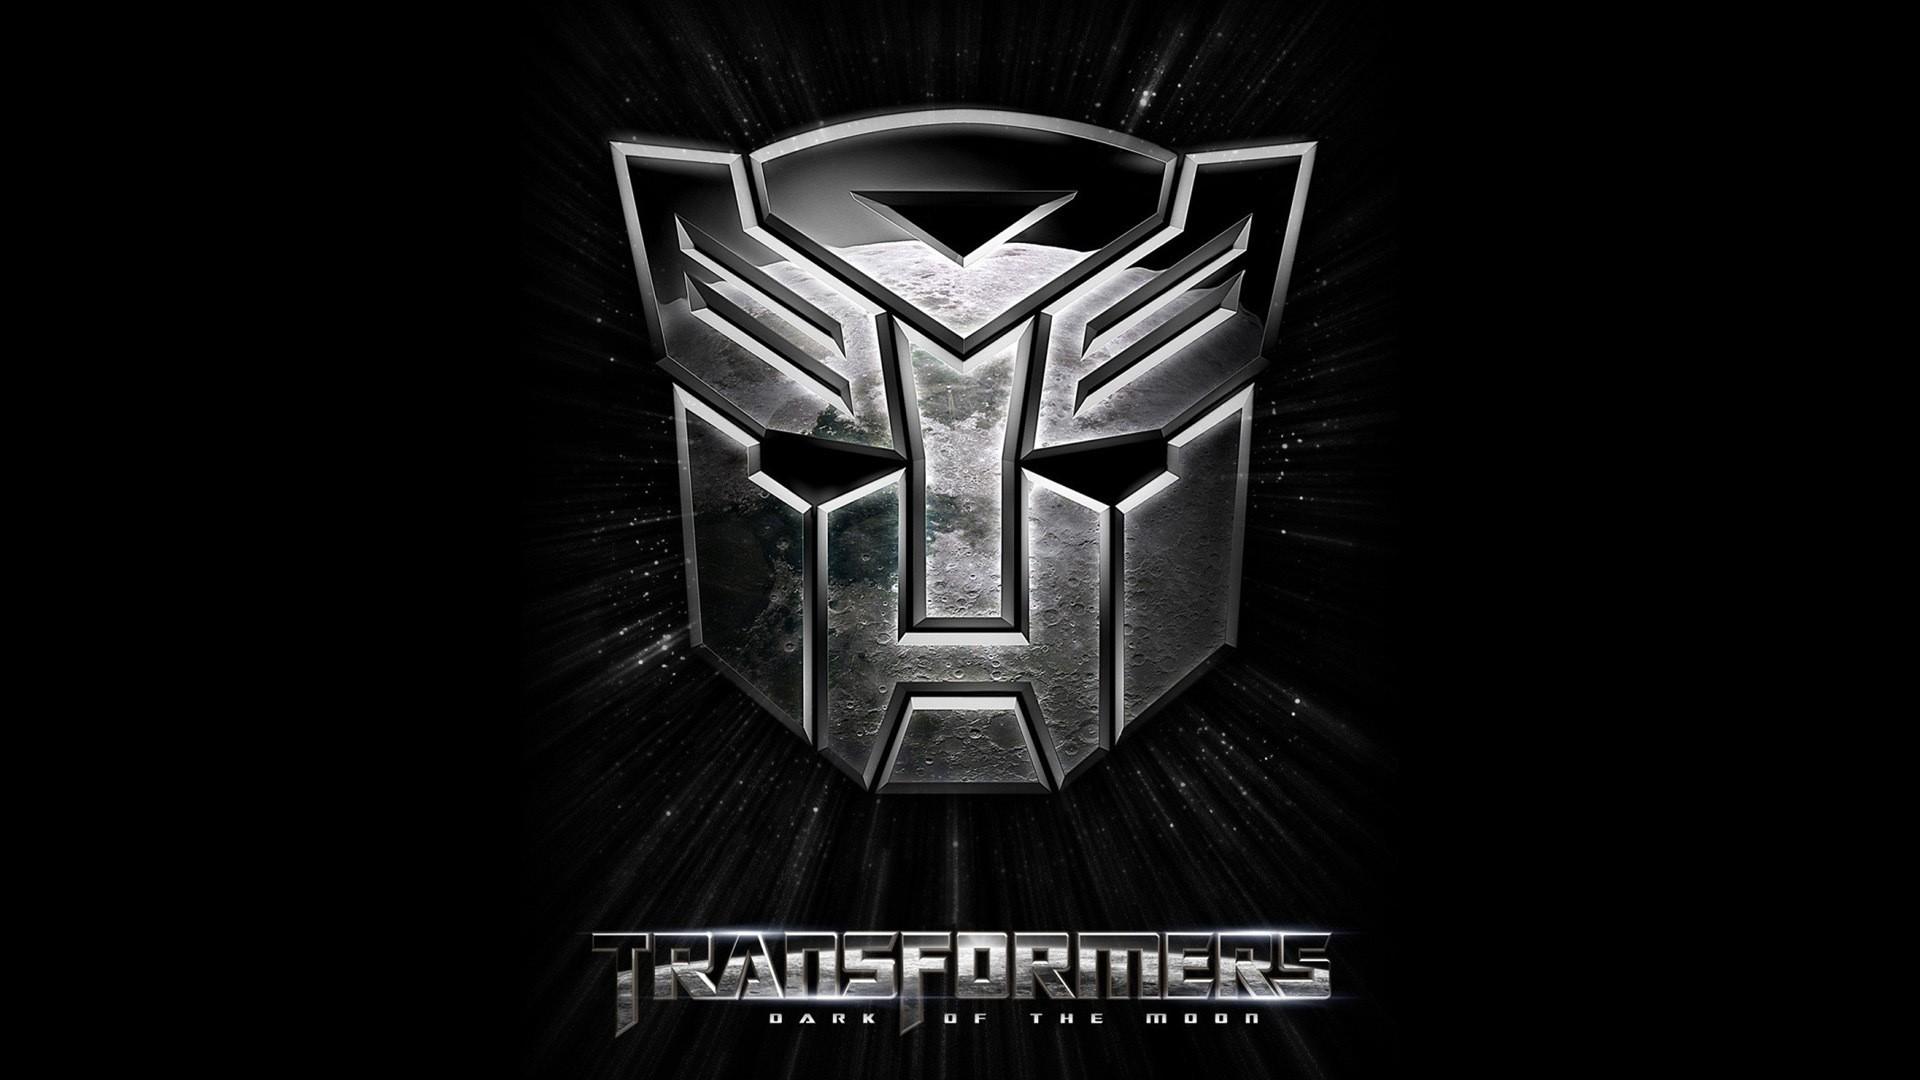 Autobots Logo Transformers Pictures HD Wallpaper Autobots Logo 1920x1080